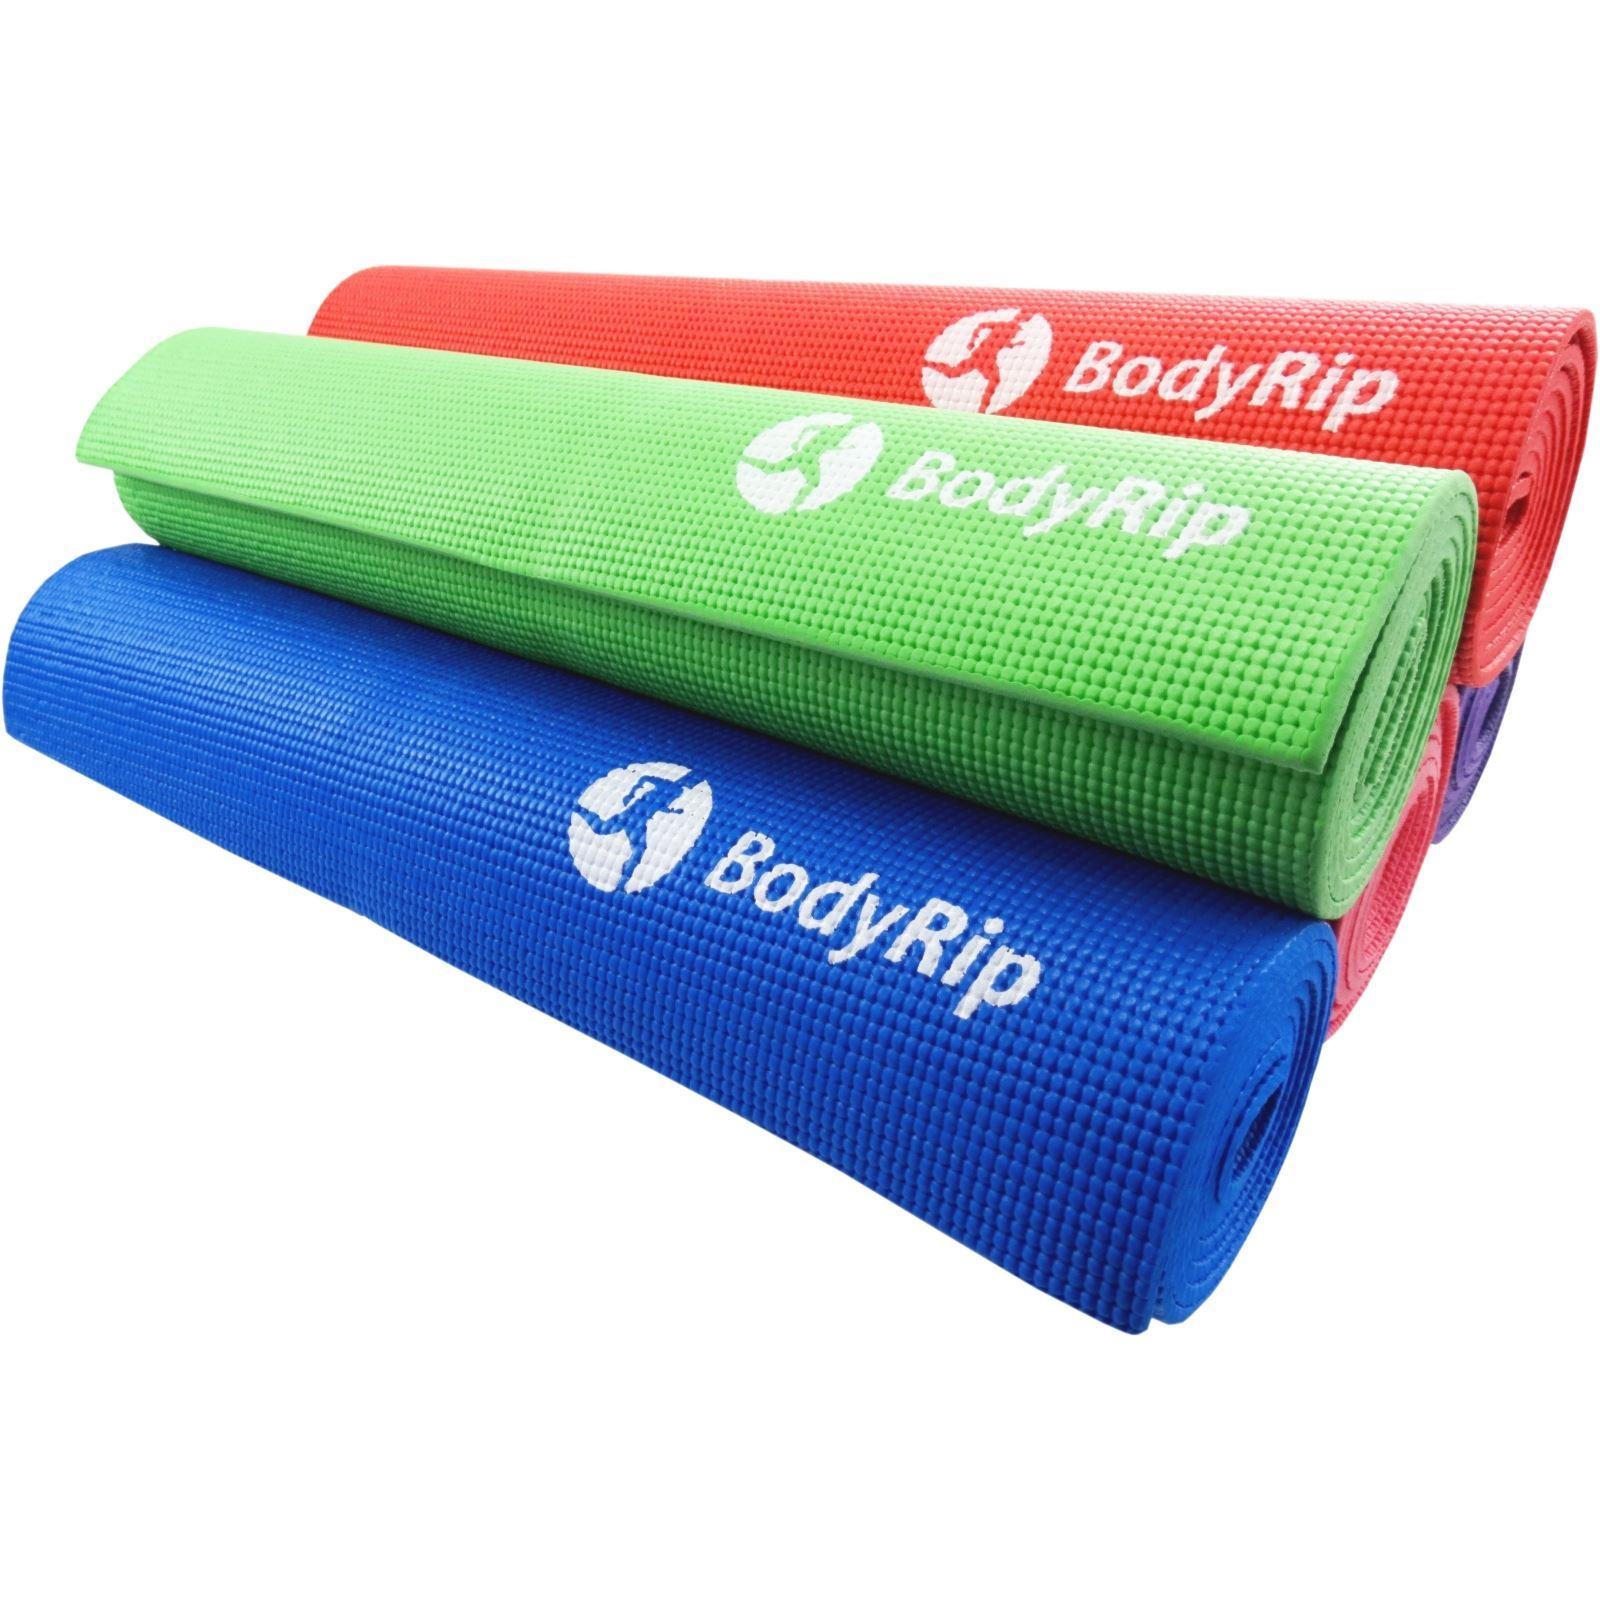 Bodyrip Thick Foam Yoga Pilates Gym Mat 6mm The More You